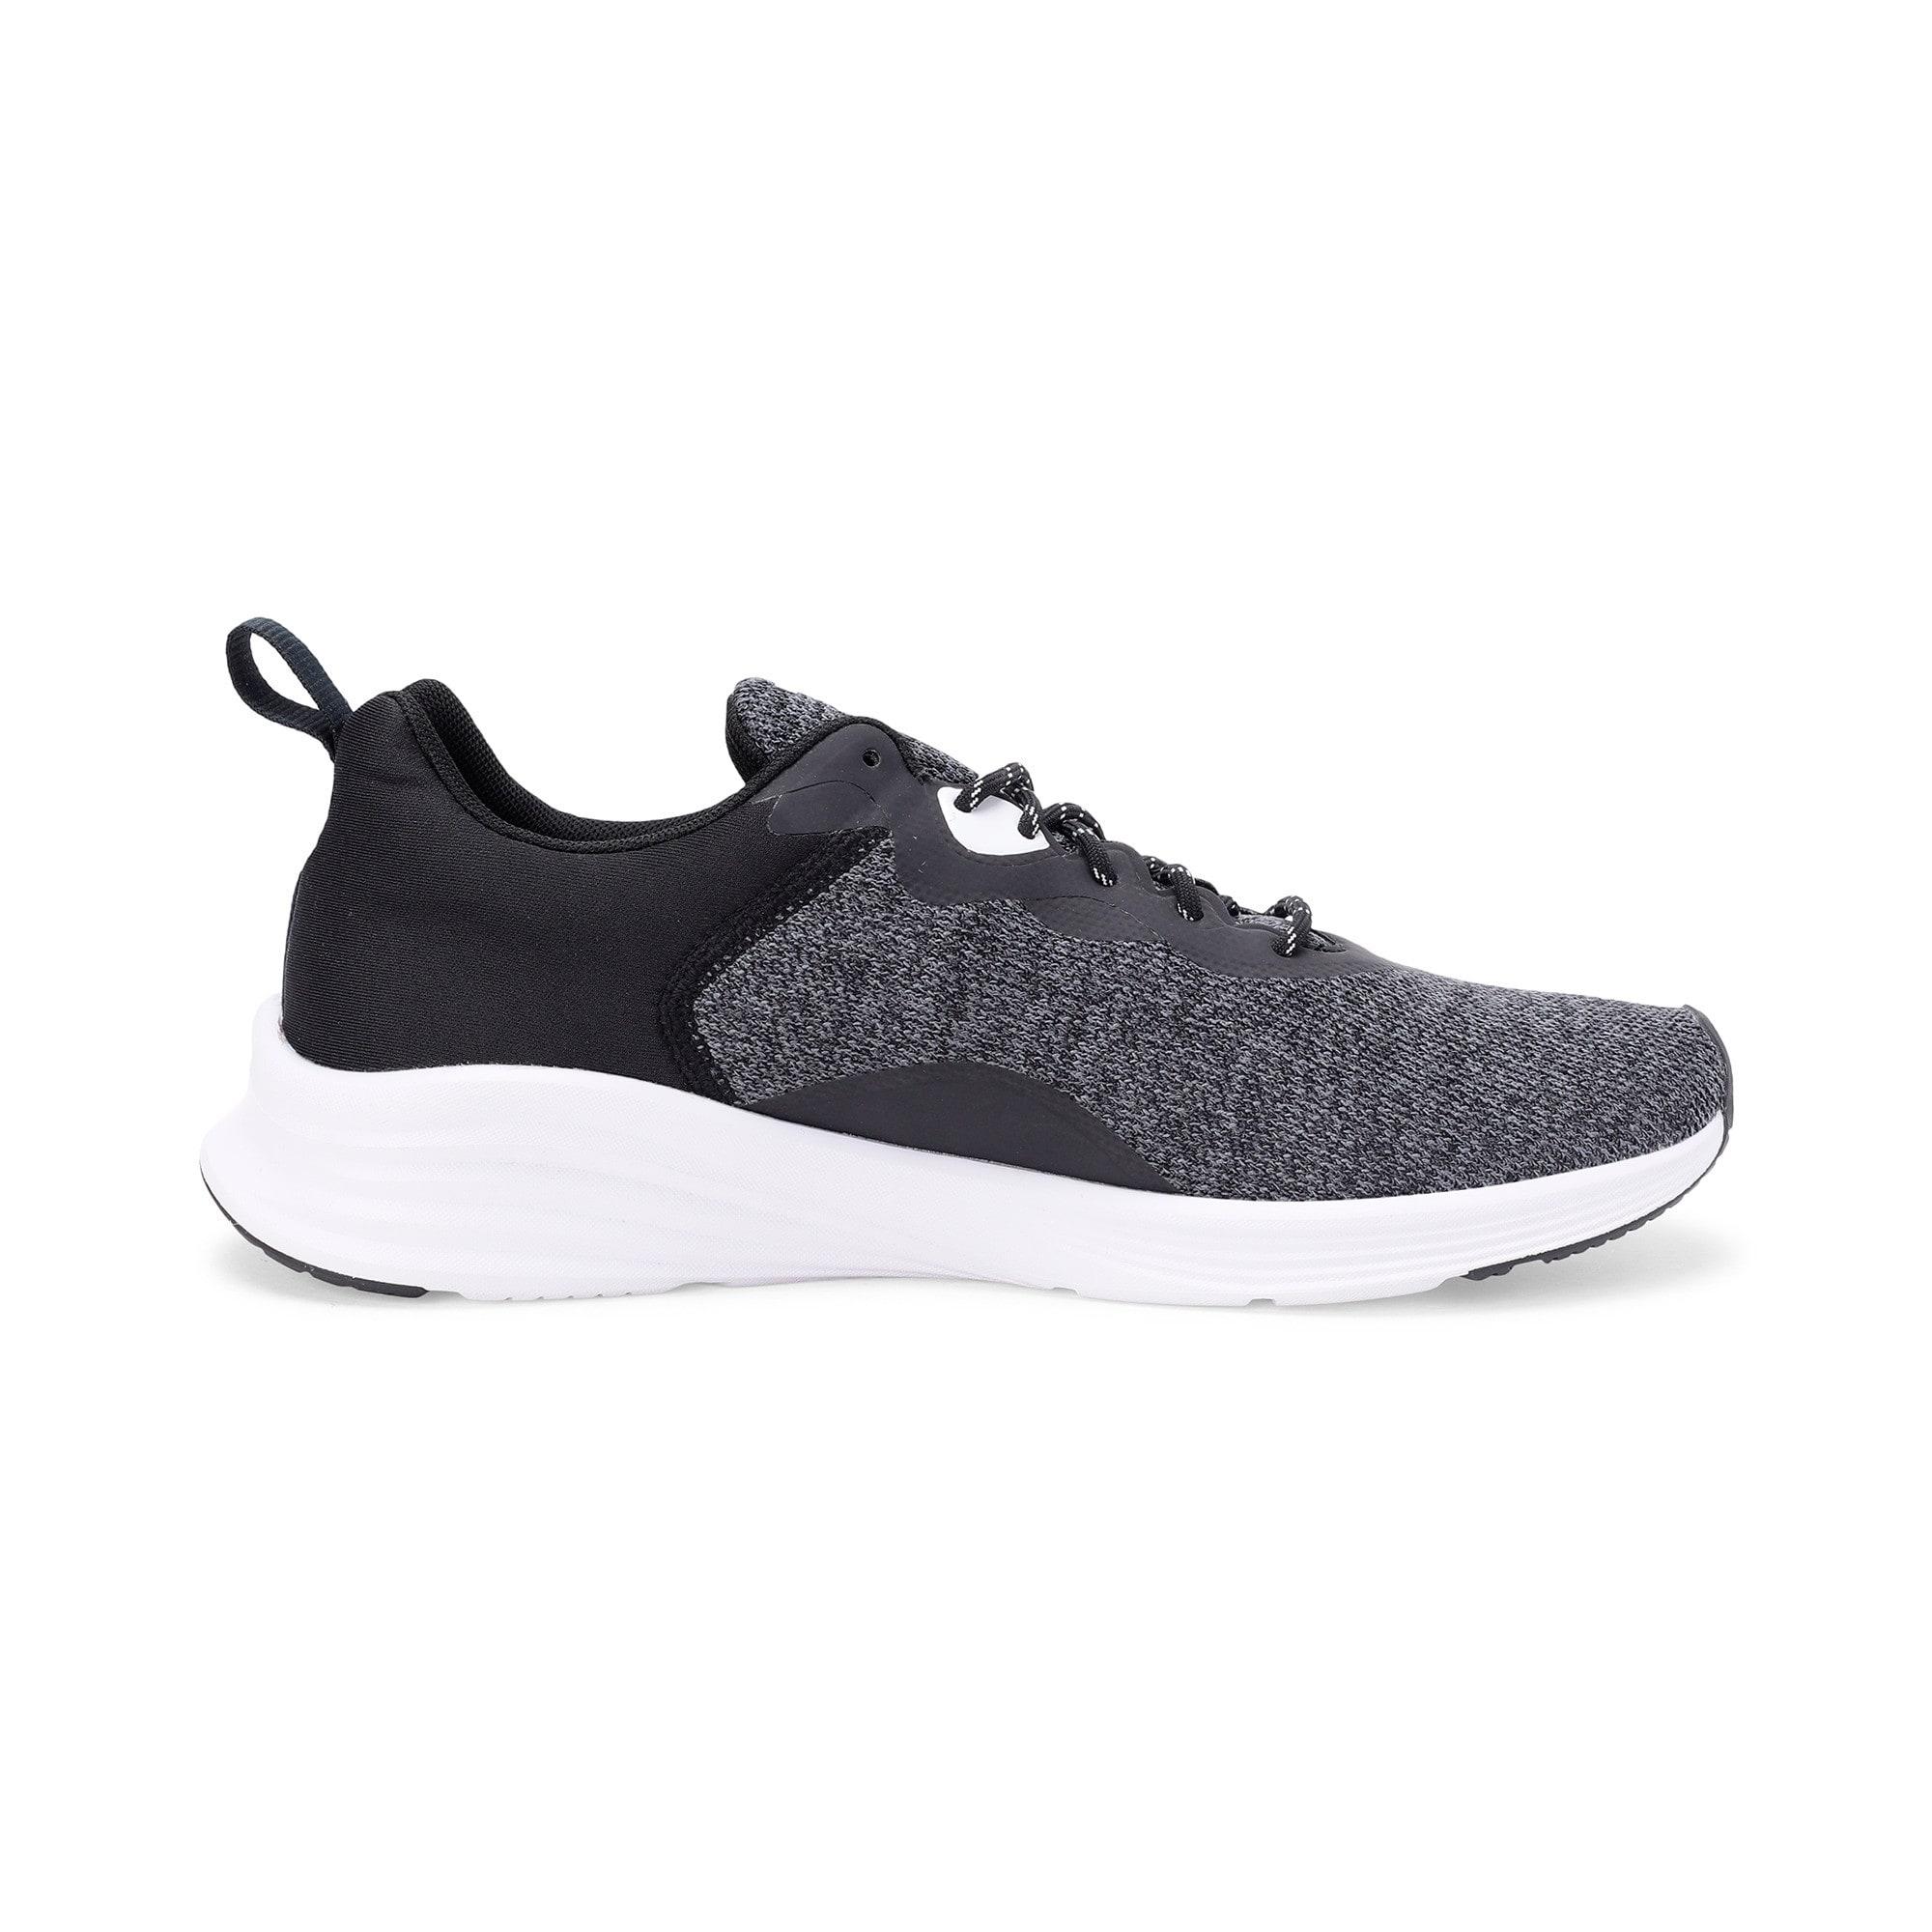 Thumbnail 5 of HYBRID Fuego evoKNIT Men's Running Shoes, CASTLEROCK-Puma Blk-Pma Wht, medium-IND